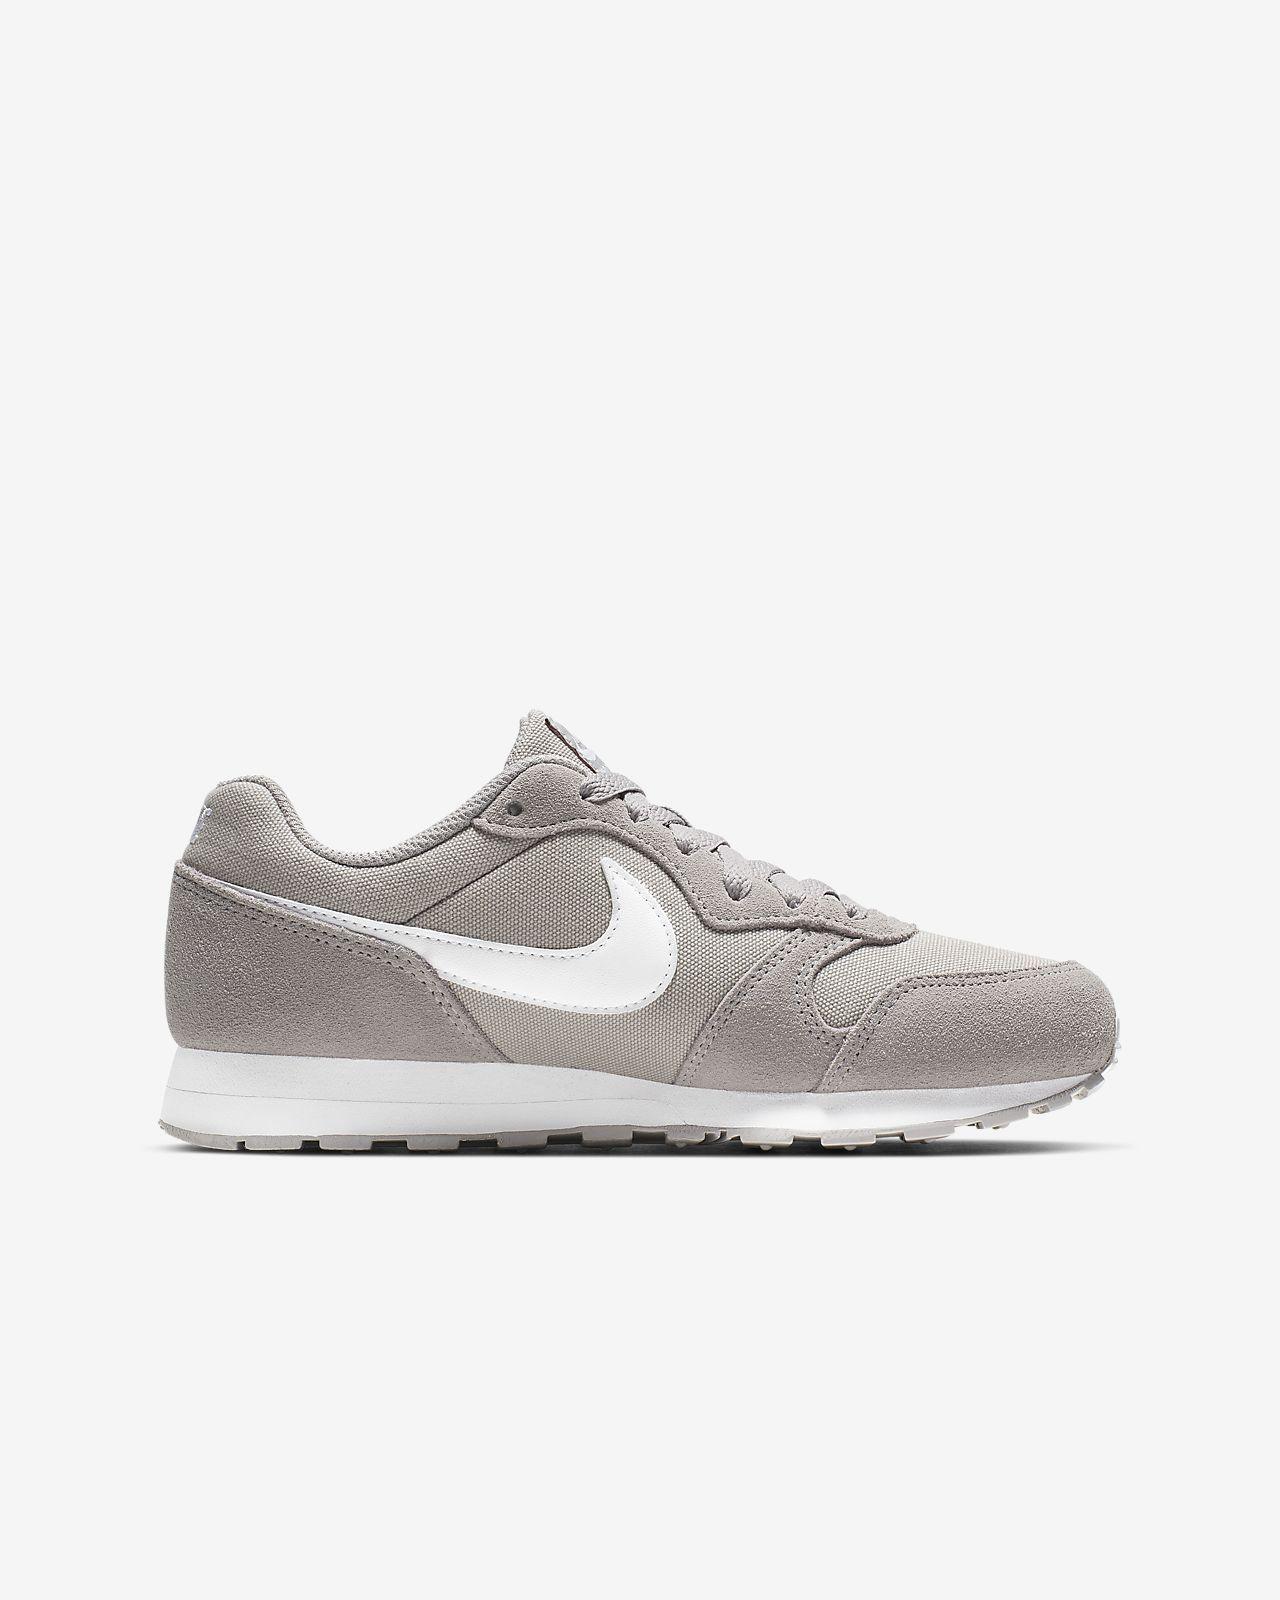 0fabf5e5c0787 Nike MD Runner 2 PE Zapatillas de running - Niño a. Nike.com ES